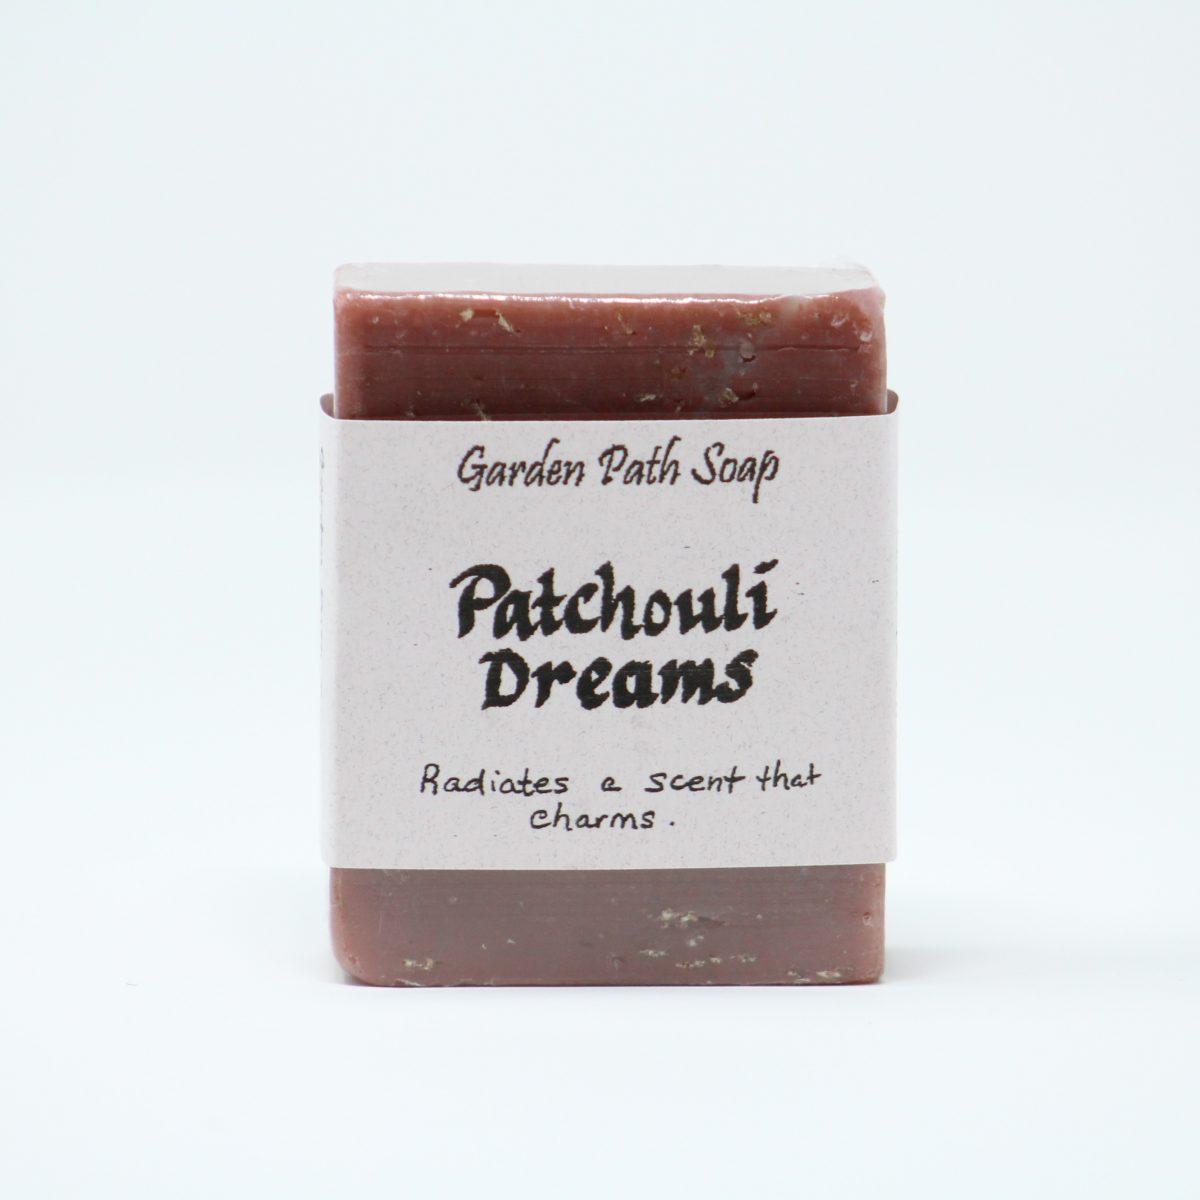 Patchouli Dreams- Homemade Lye Soaps- Family Farm Handcrafts